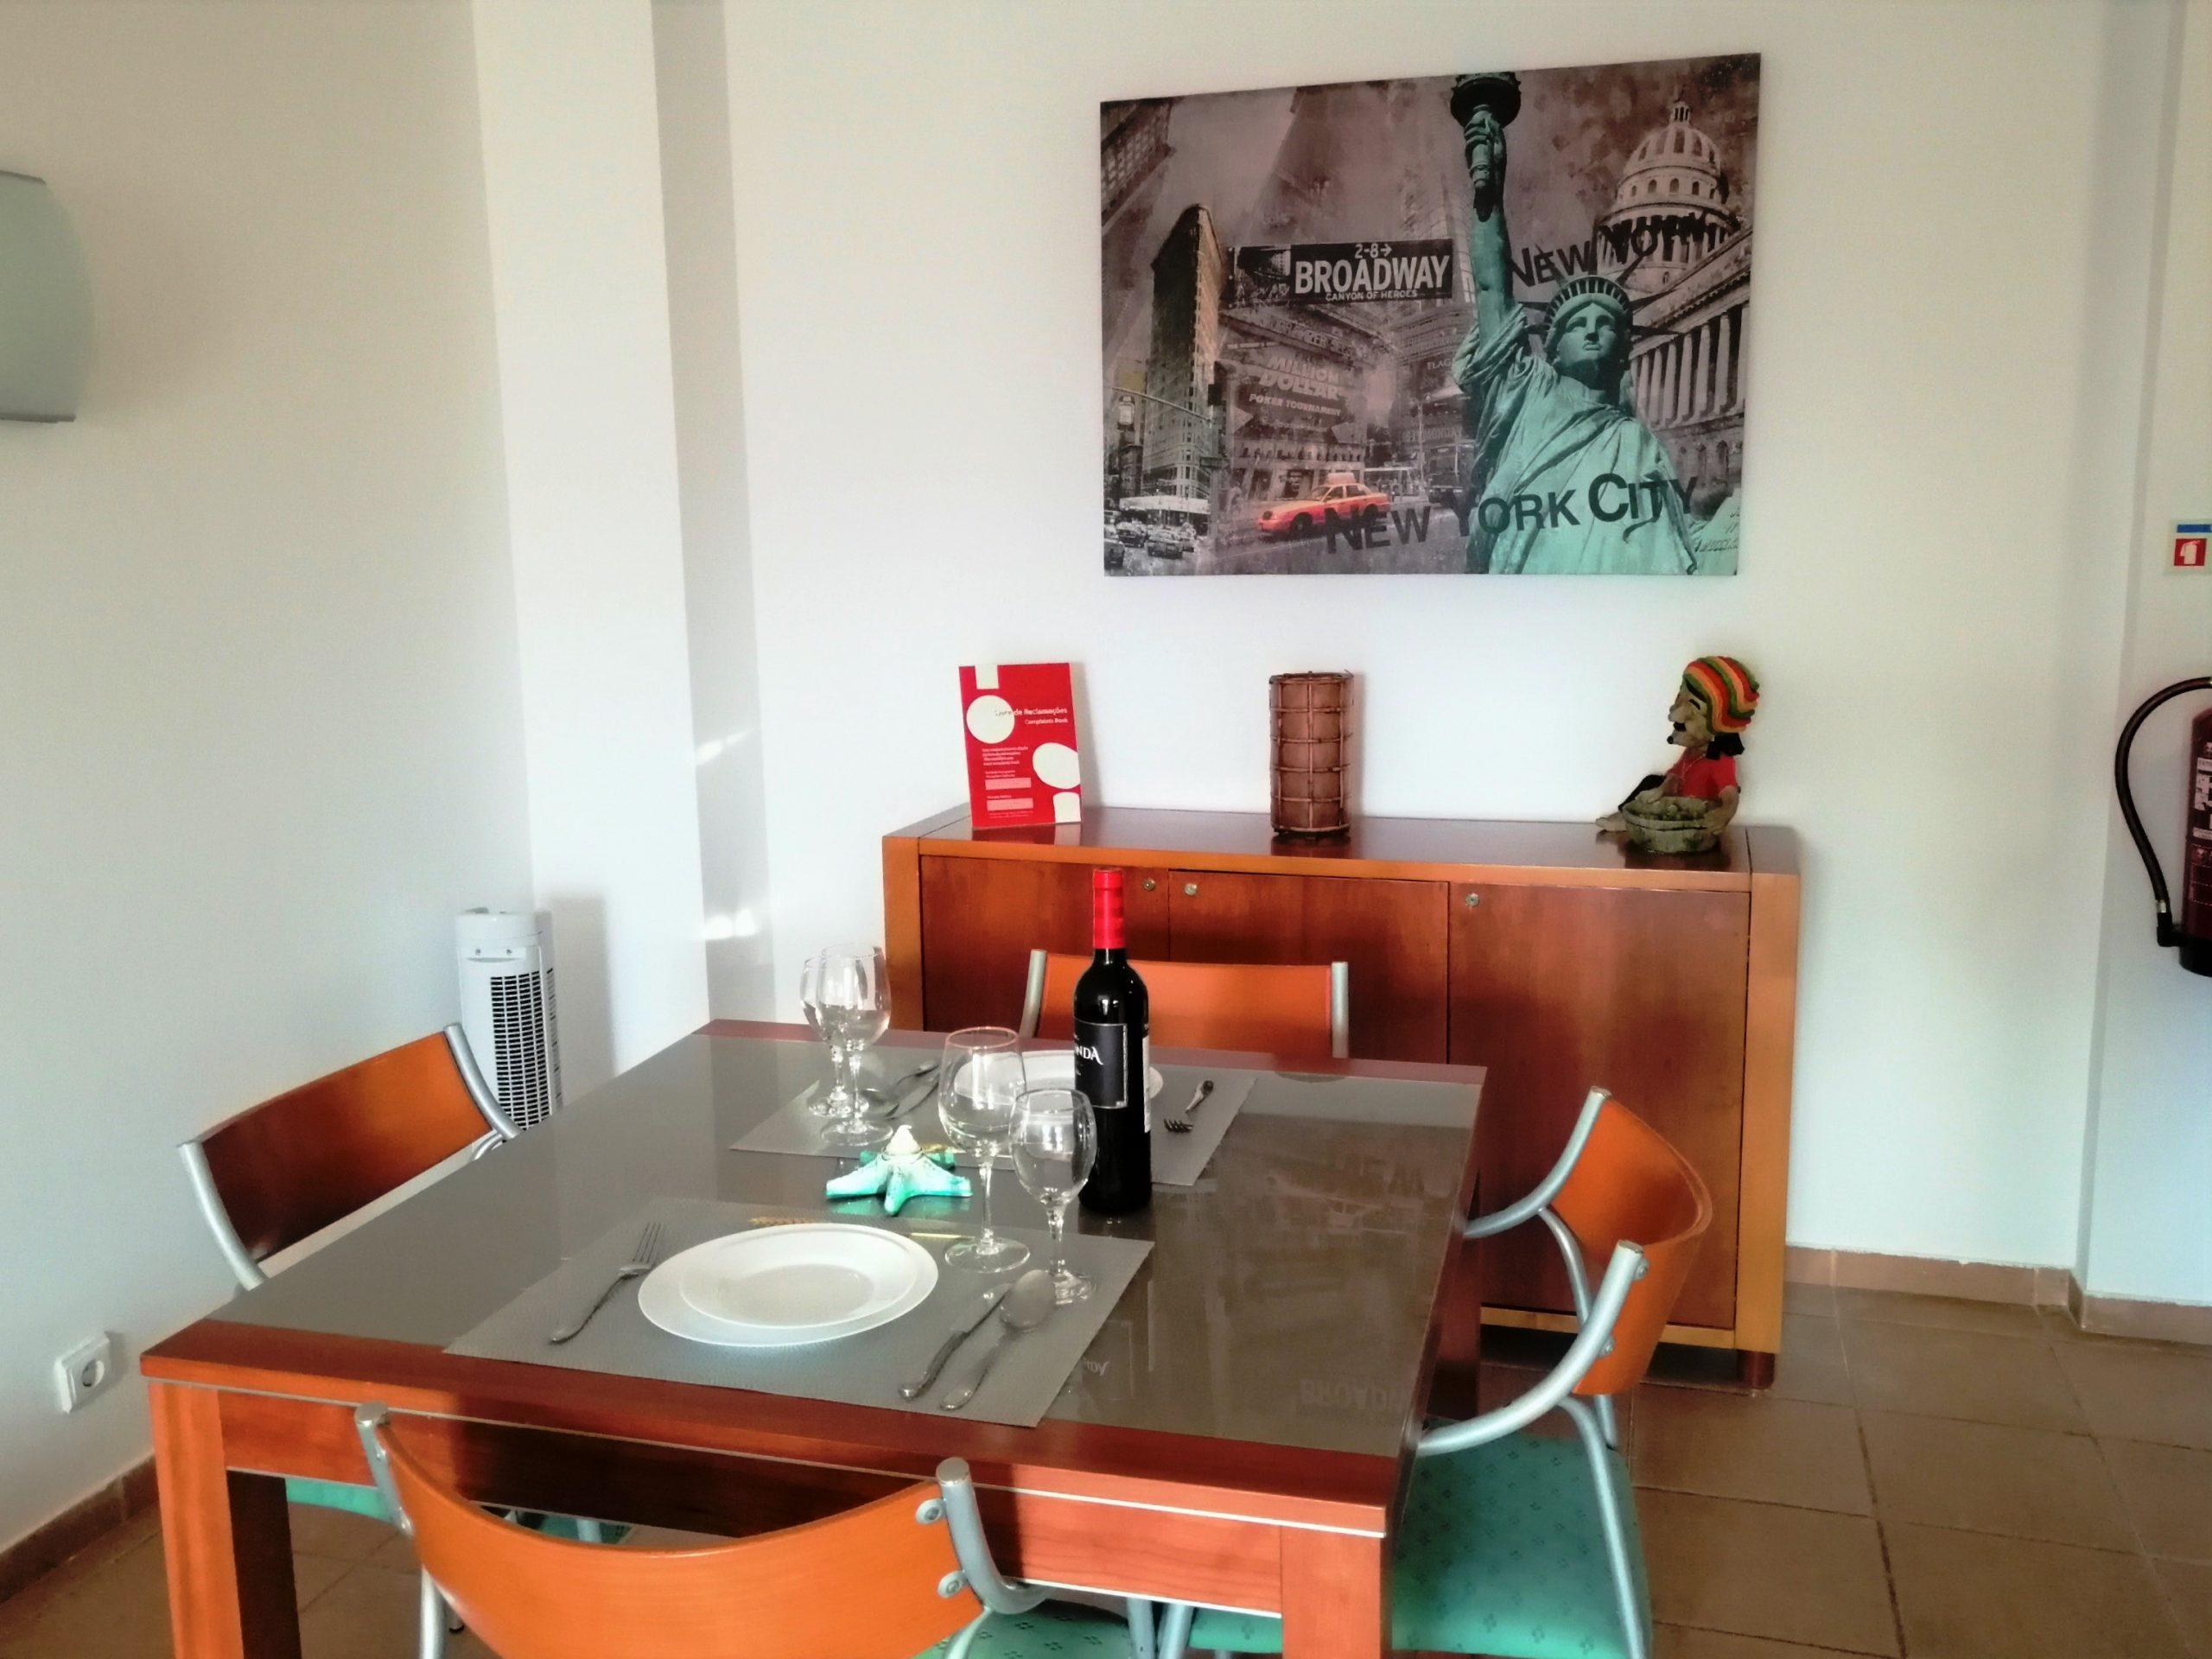 Holiday apartments and villas for rent, T1 Albufeira em cond. fechado c/ piscina 4/5 pessoas JUN / JUL / AGO / SET in Albufeira, Portugal Algarve, REF_IMG_14867_14875